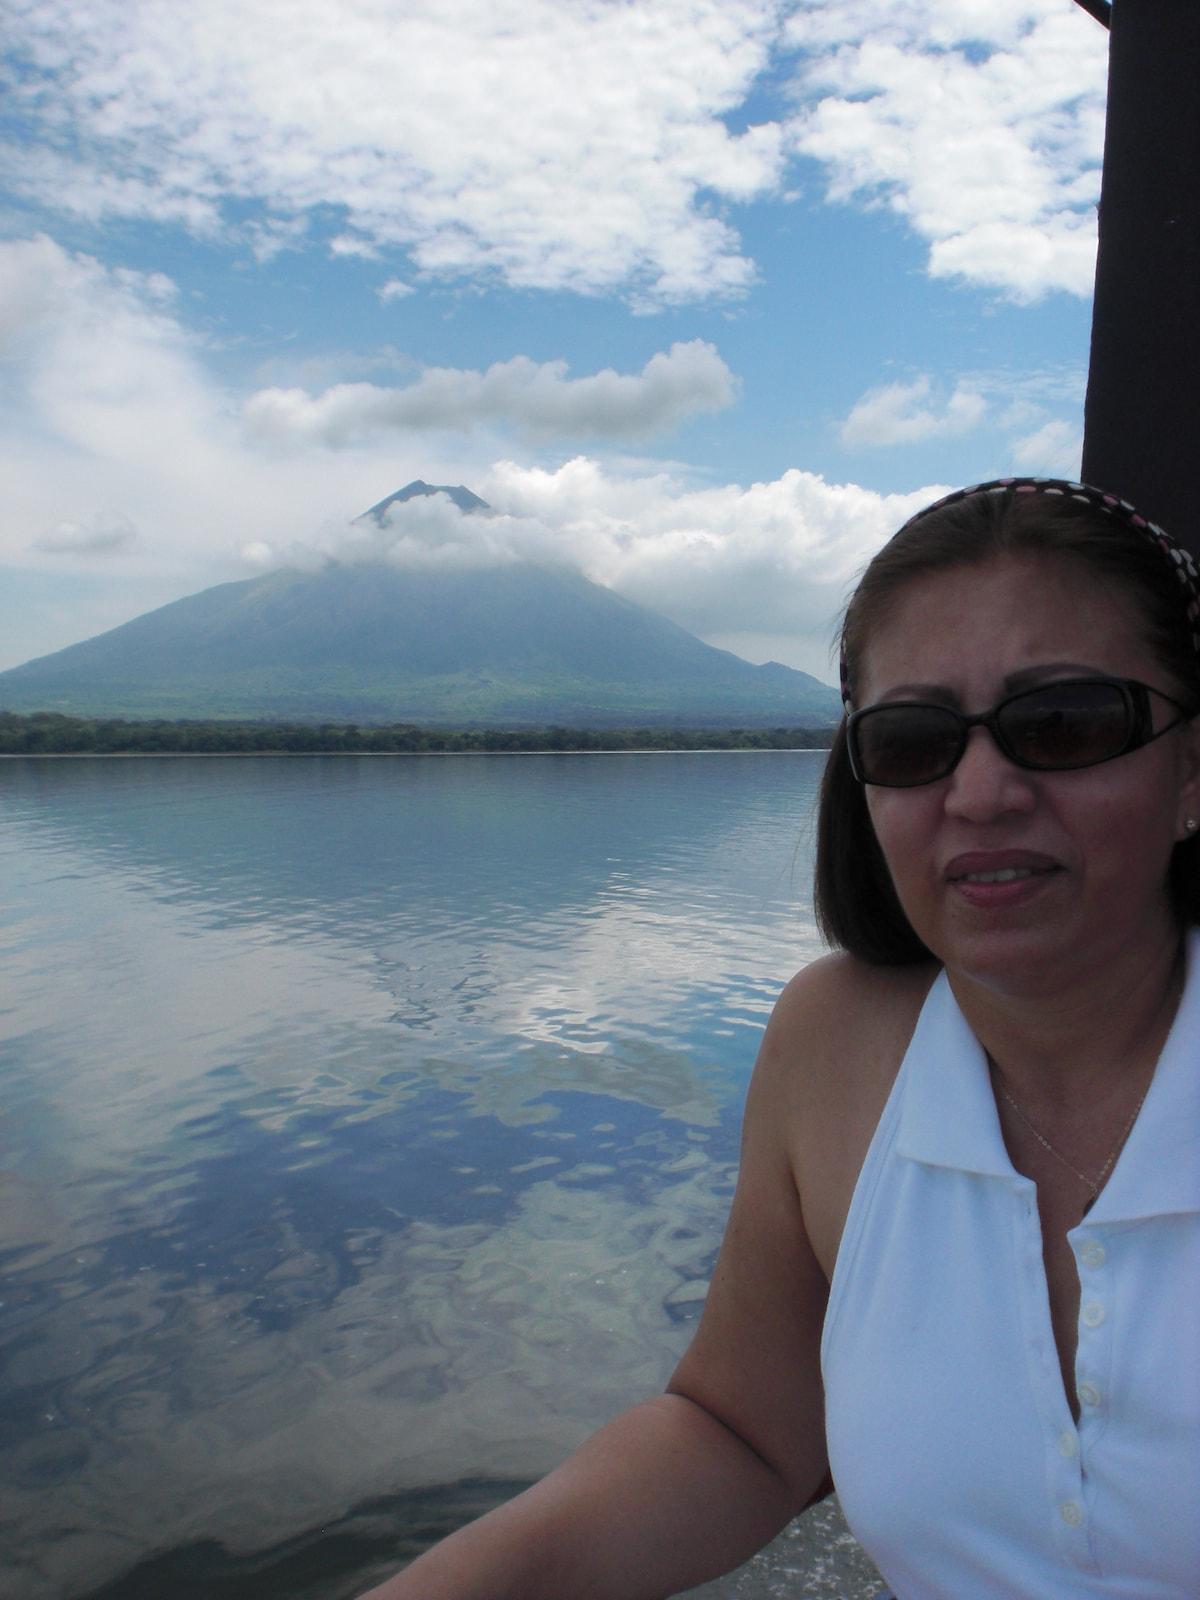 Ljarquin from Managua